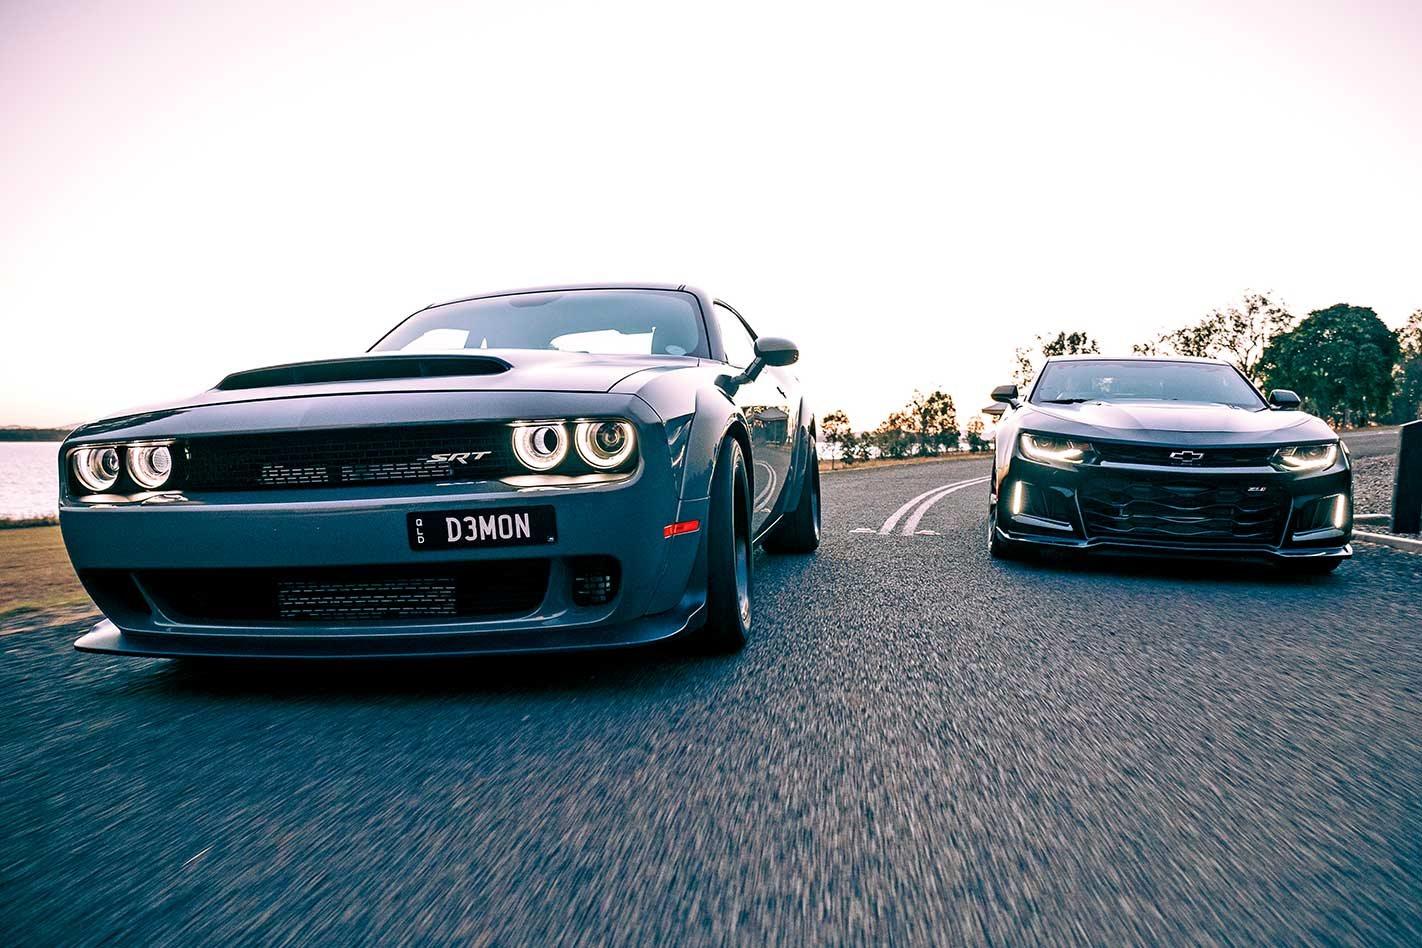 2019 Dodge Challenger Demon Vs Hennessey Exorcist Rhd Comparison Review